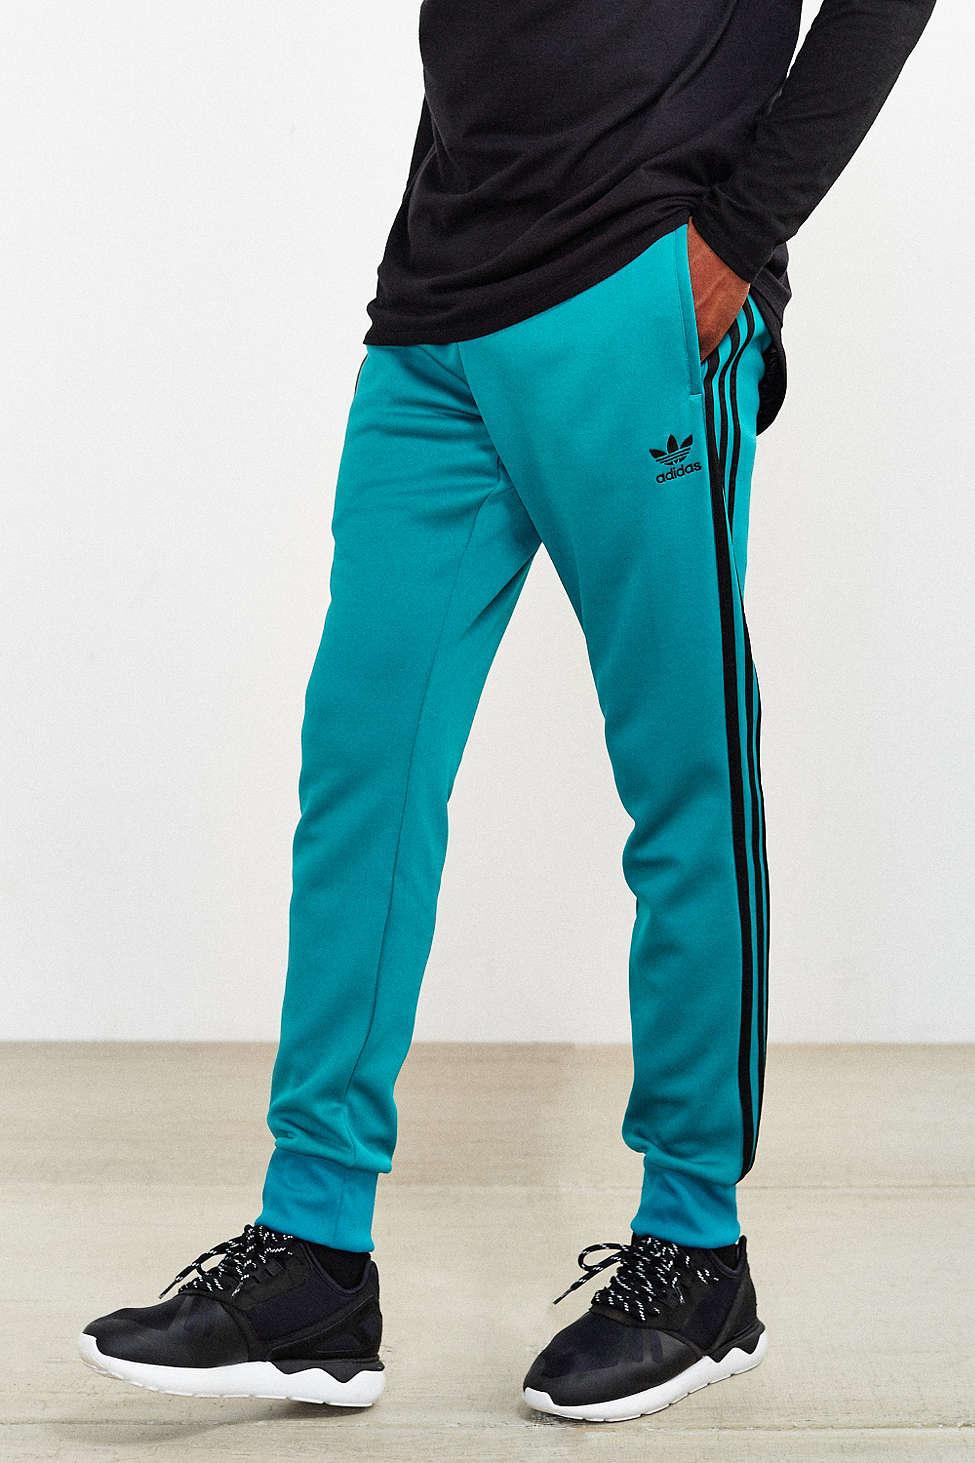 adidas Originals Track Pant Mens Superstar SST Tracksuit Bottoms Trefoil Slim Fit Pant New BQ7784, Burgundy, XS